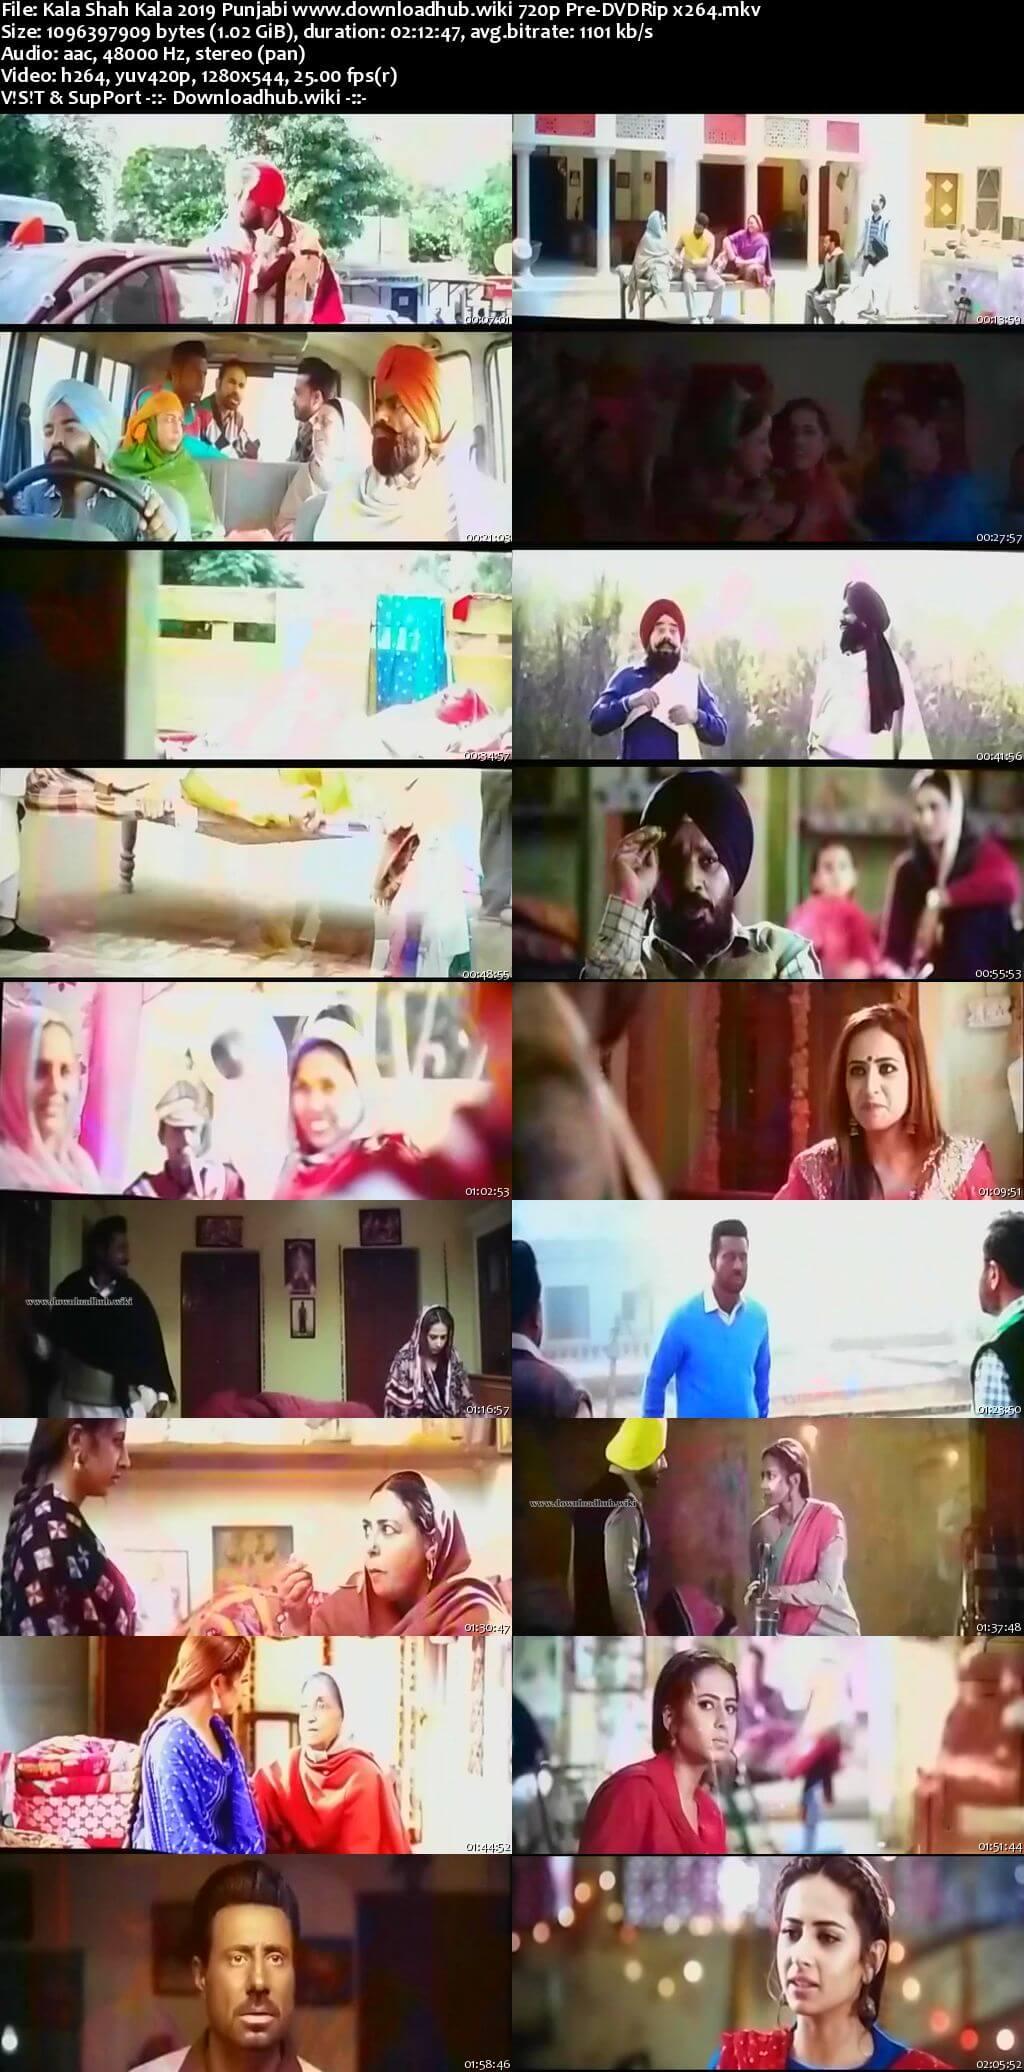 Kala Shah Kala 2019 Punjabi 720p Pre-DVDRip x264